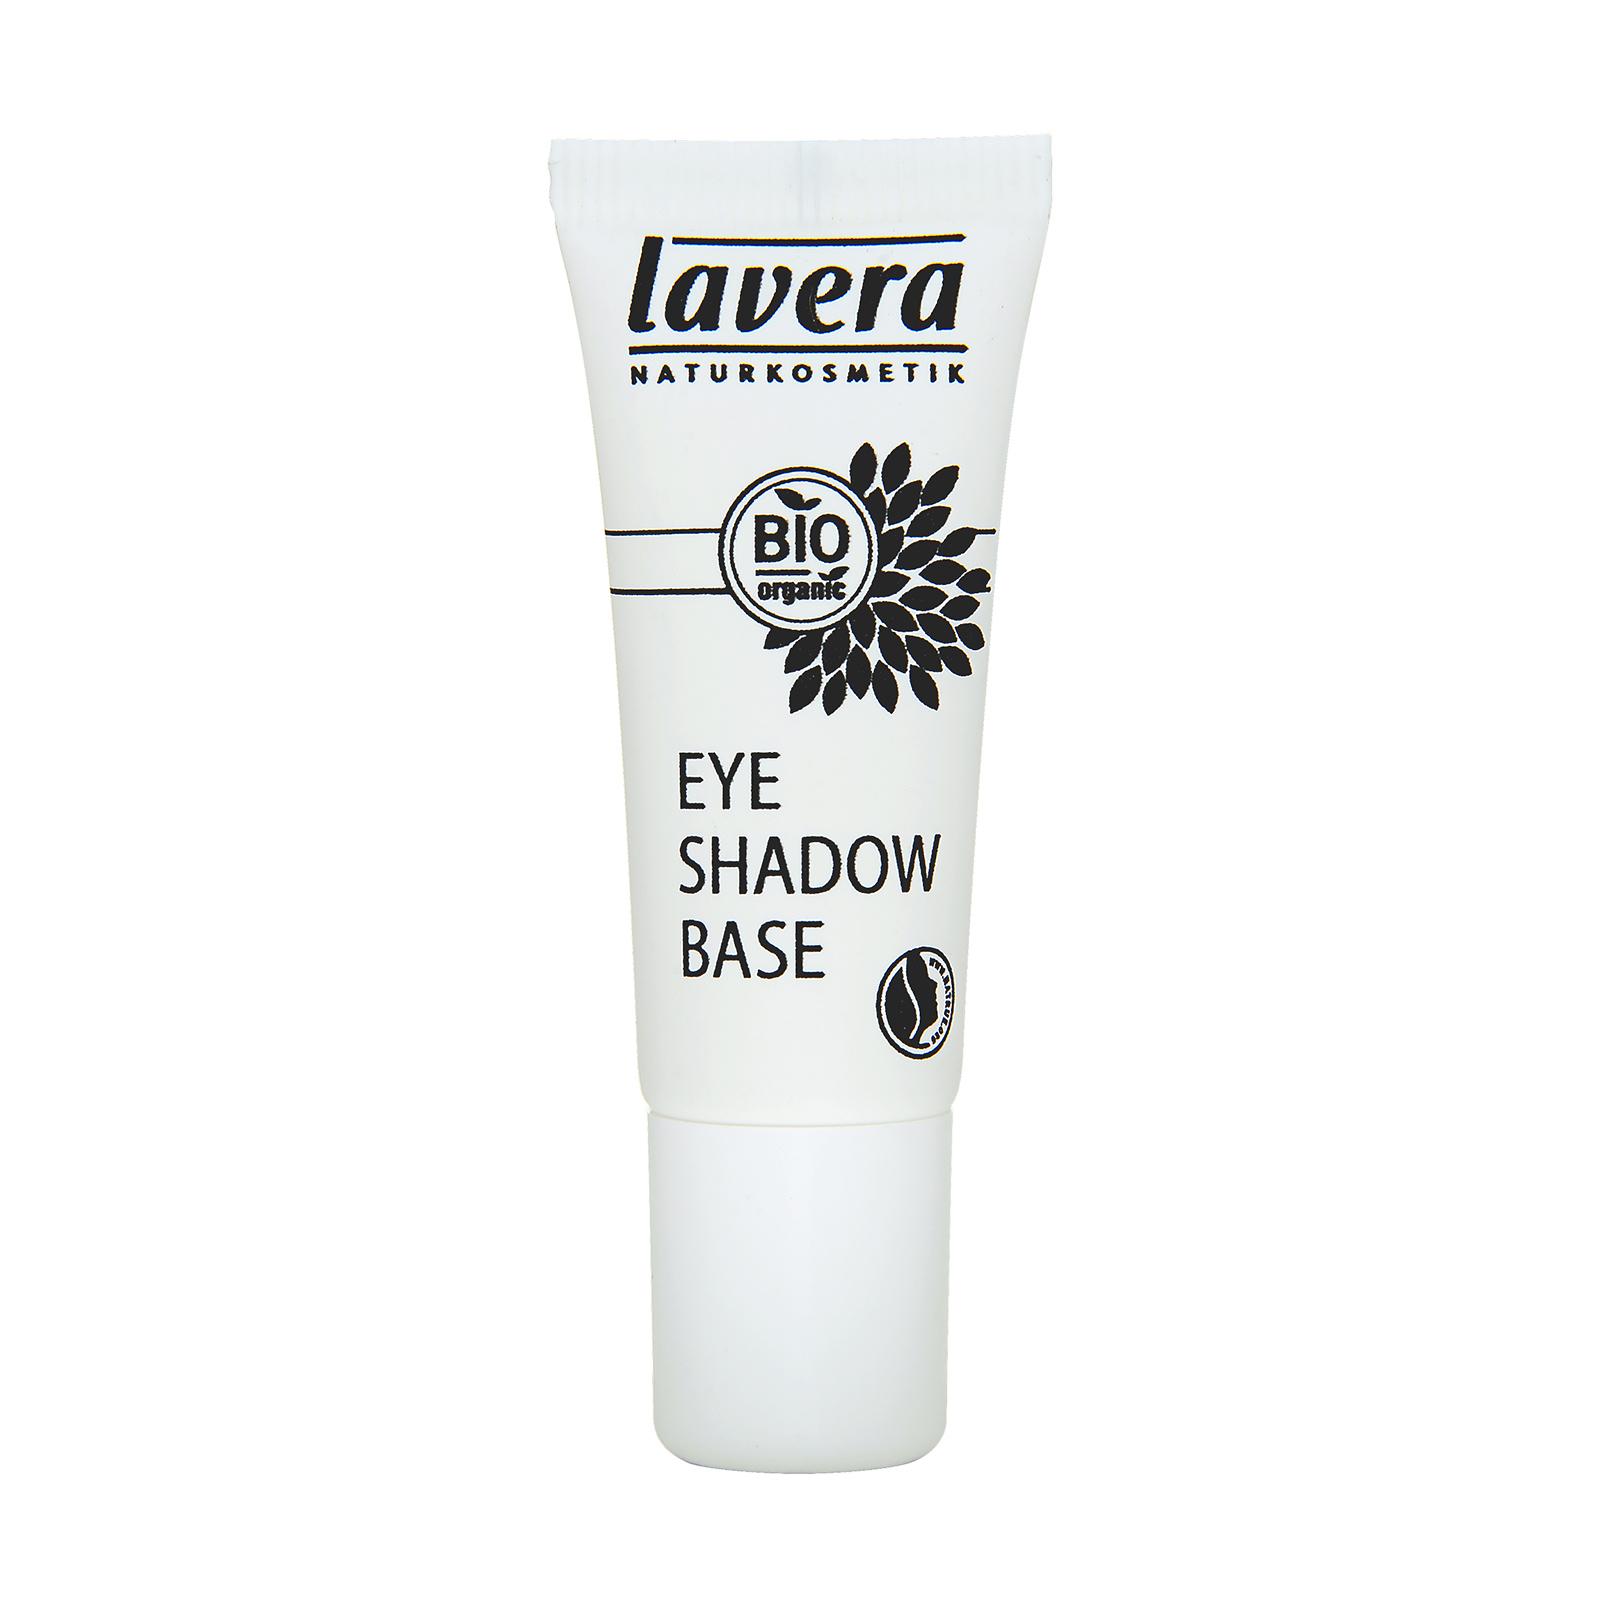 Lavera  Eyeshadow Base 0.3oz, 9ml